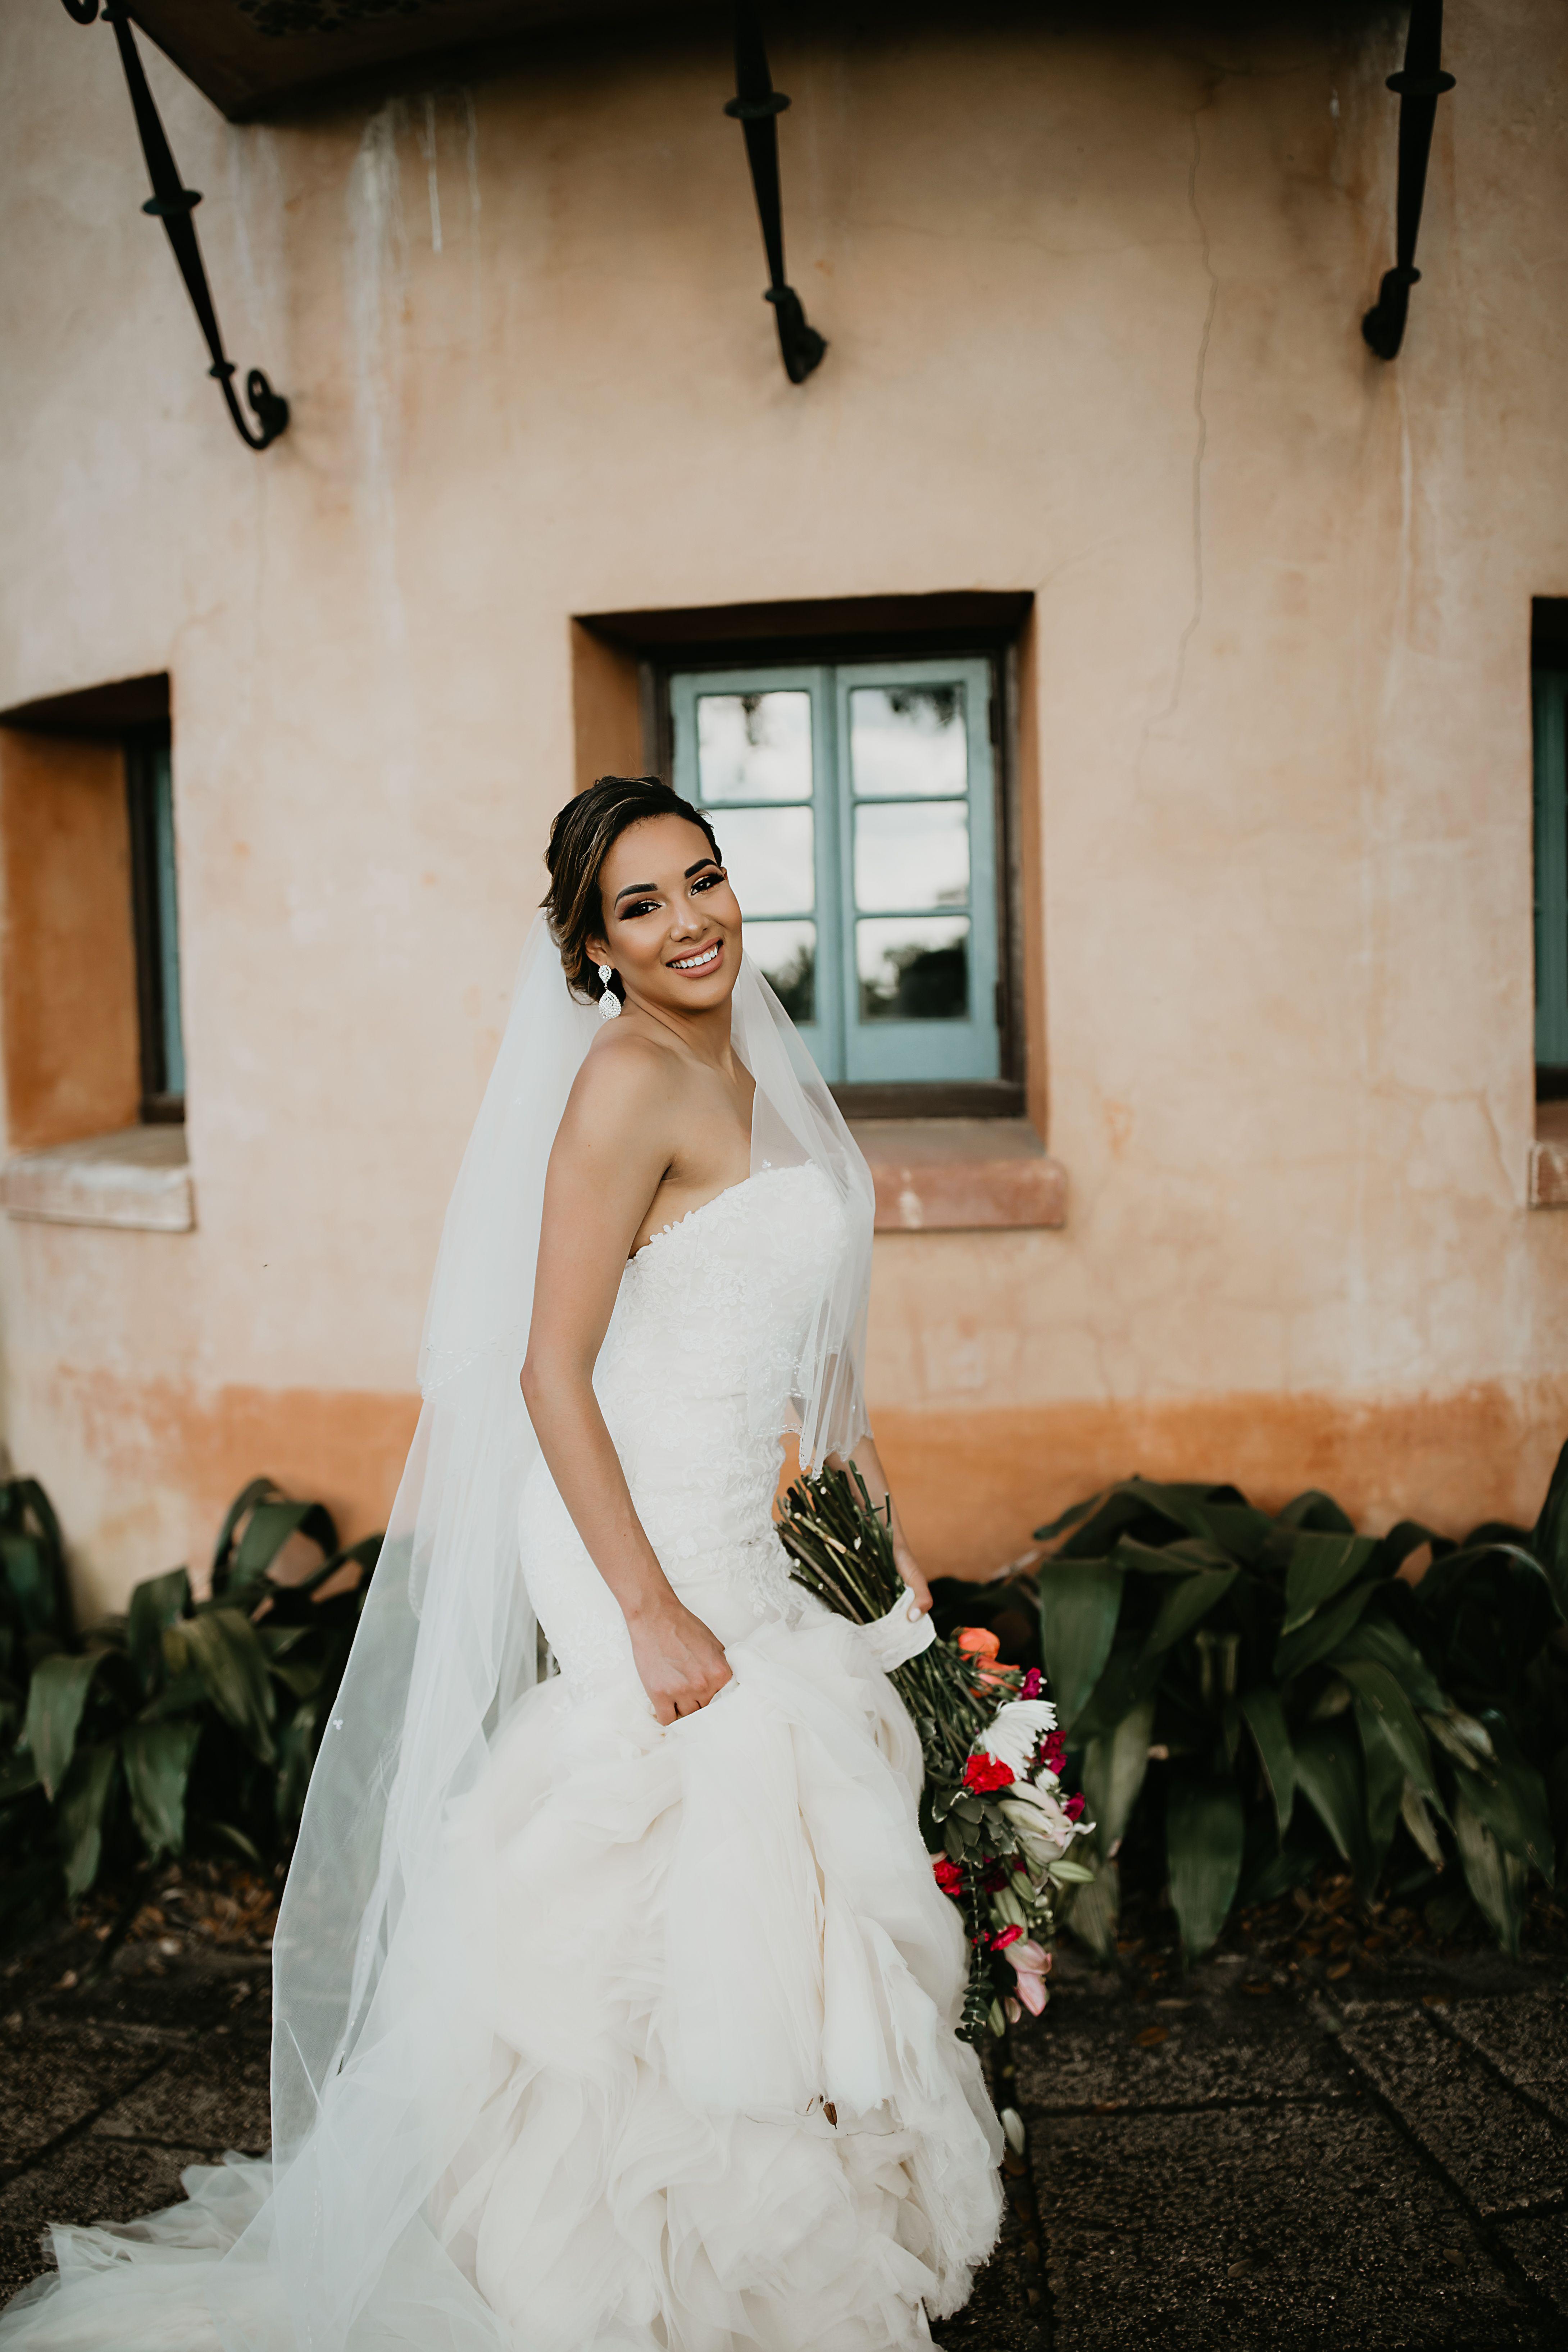 Bok tower gardens bridal session in 2020 bridal